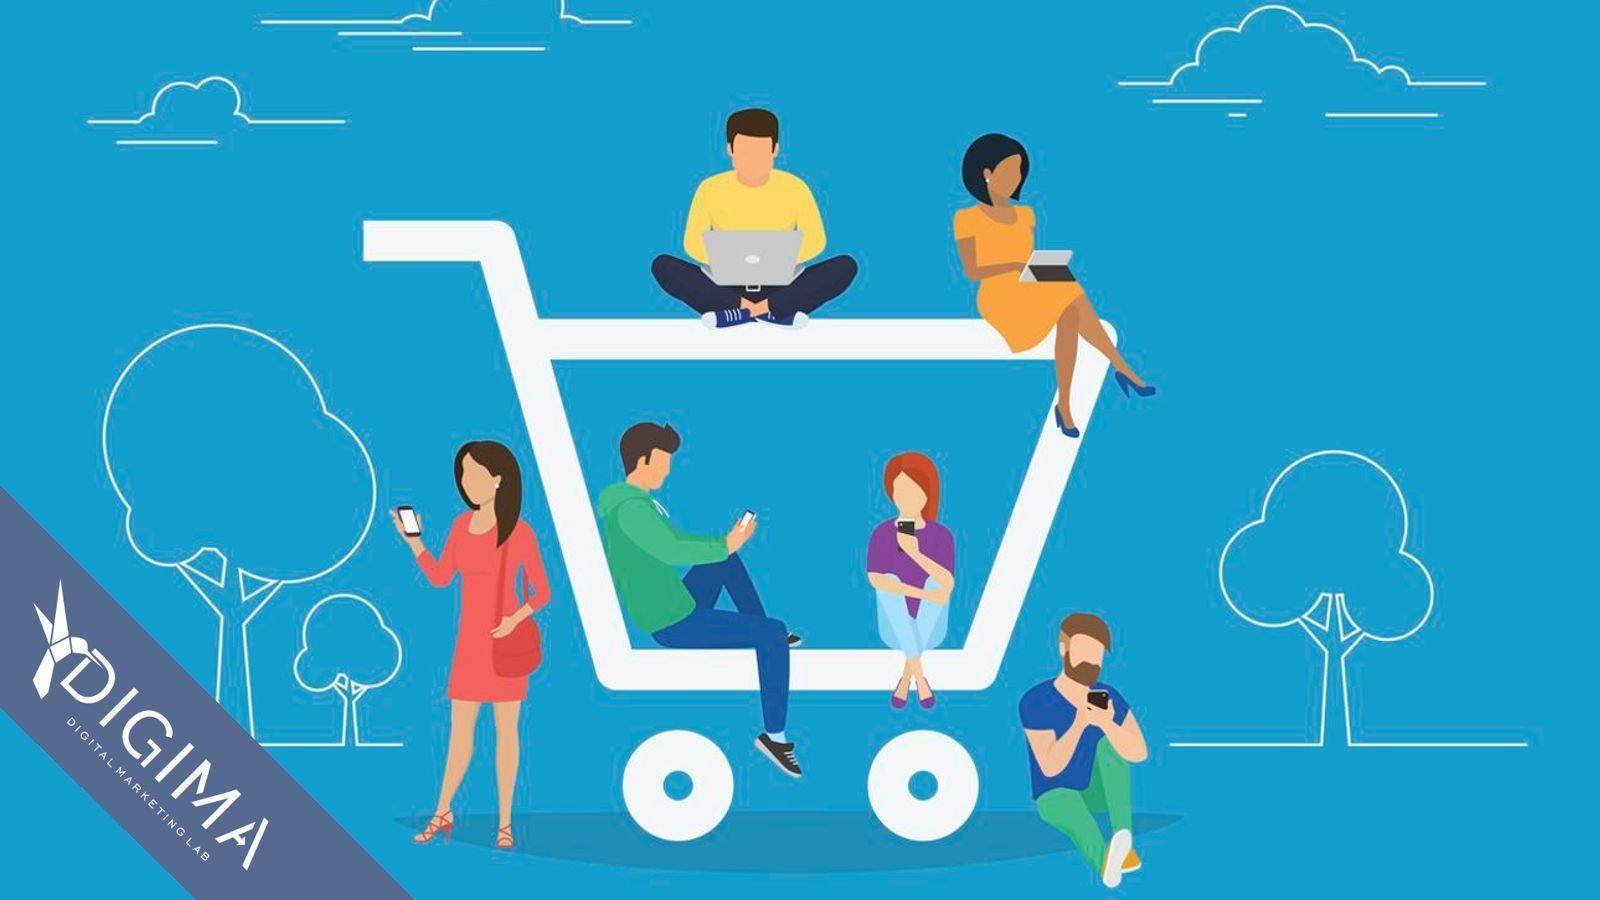 10 semplici strategie di e-commerce per raggiungere più clienti